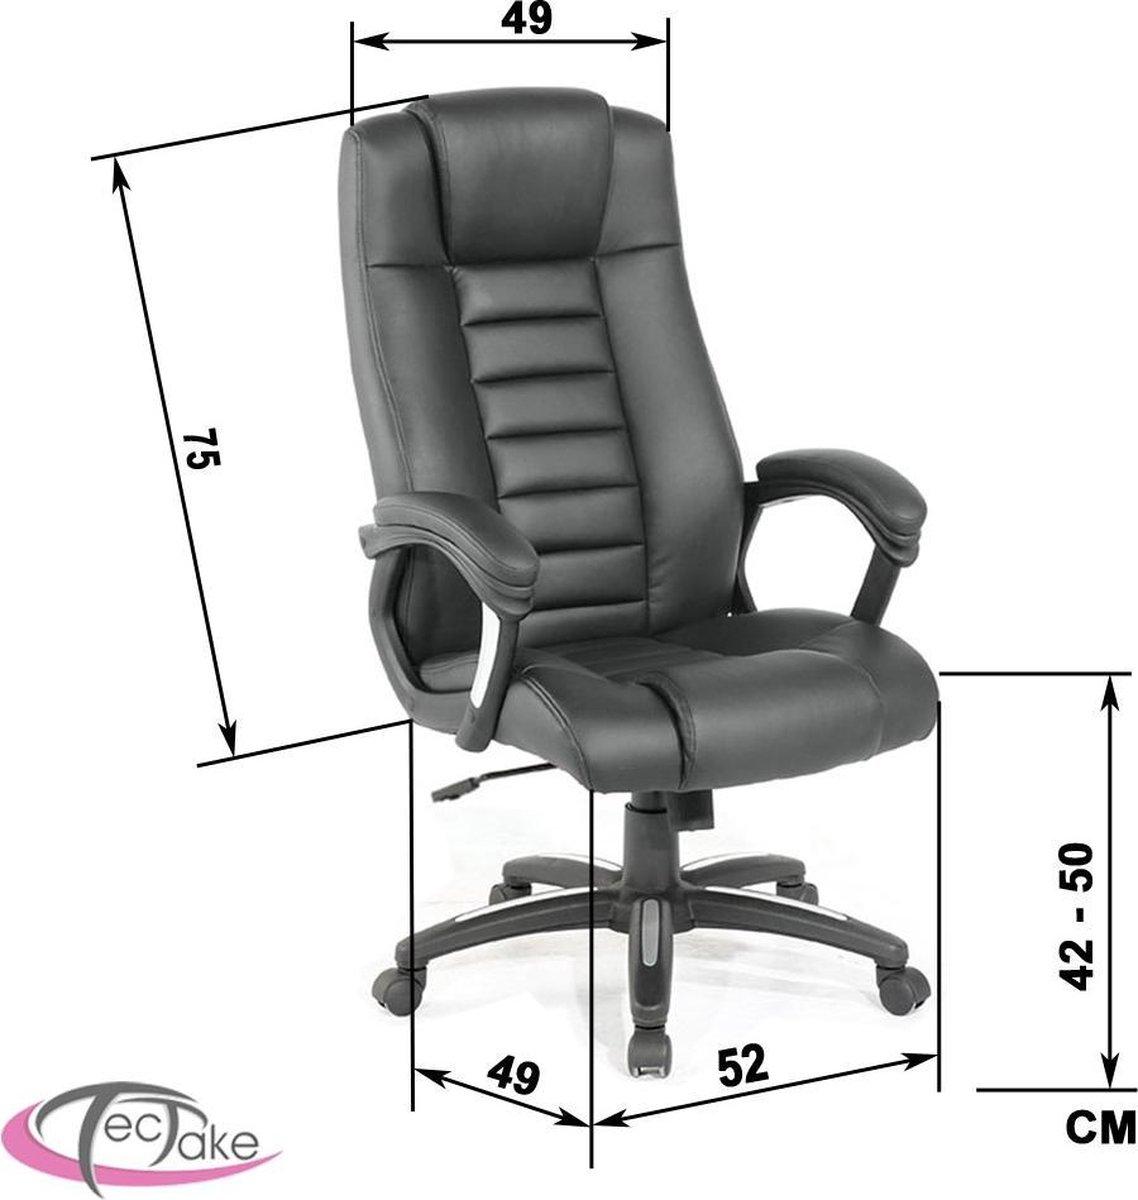 Tectake Luxe design Bureaustoel - Zwart - Tectake